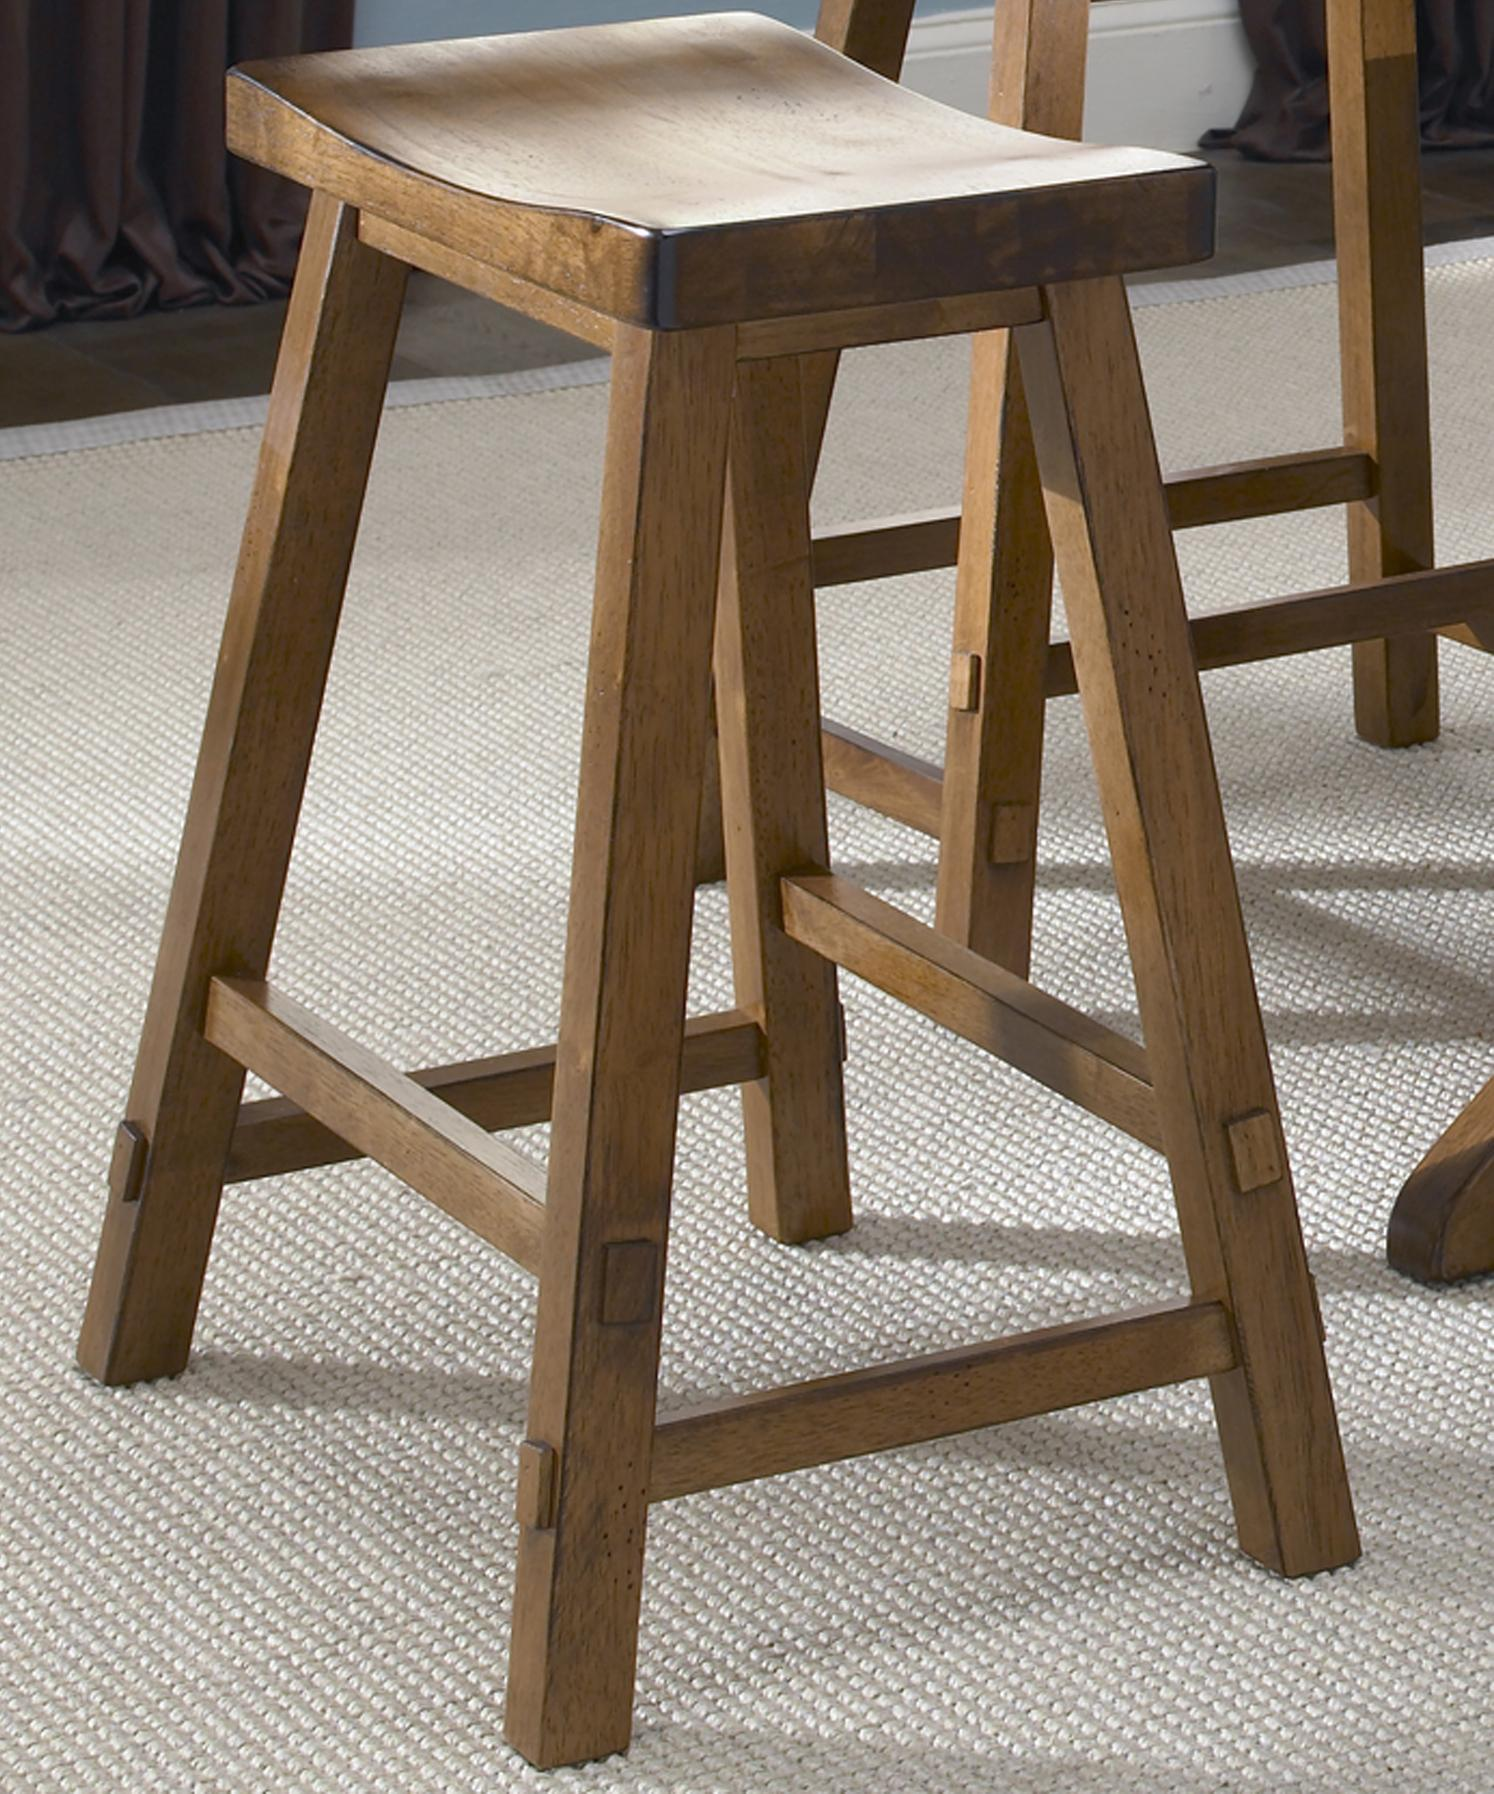 Liberty Furniture Creations II 30 Inch Sawhorse Barstool - Item Number: 38-B1830